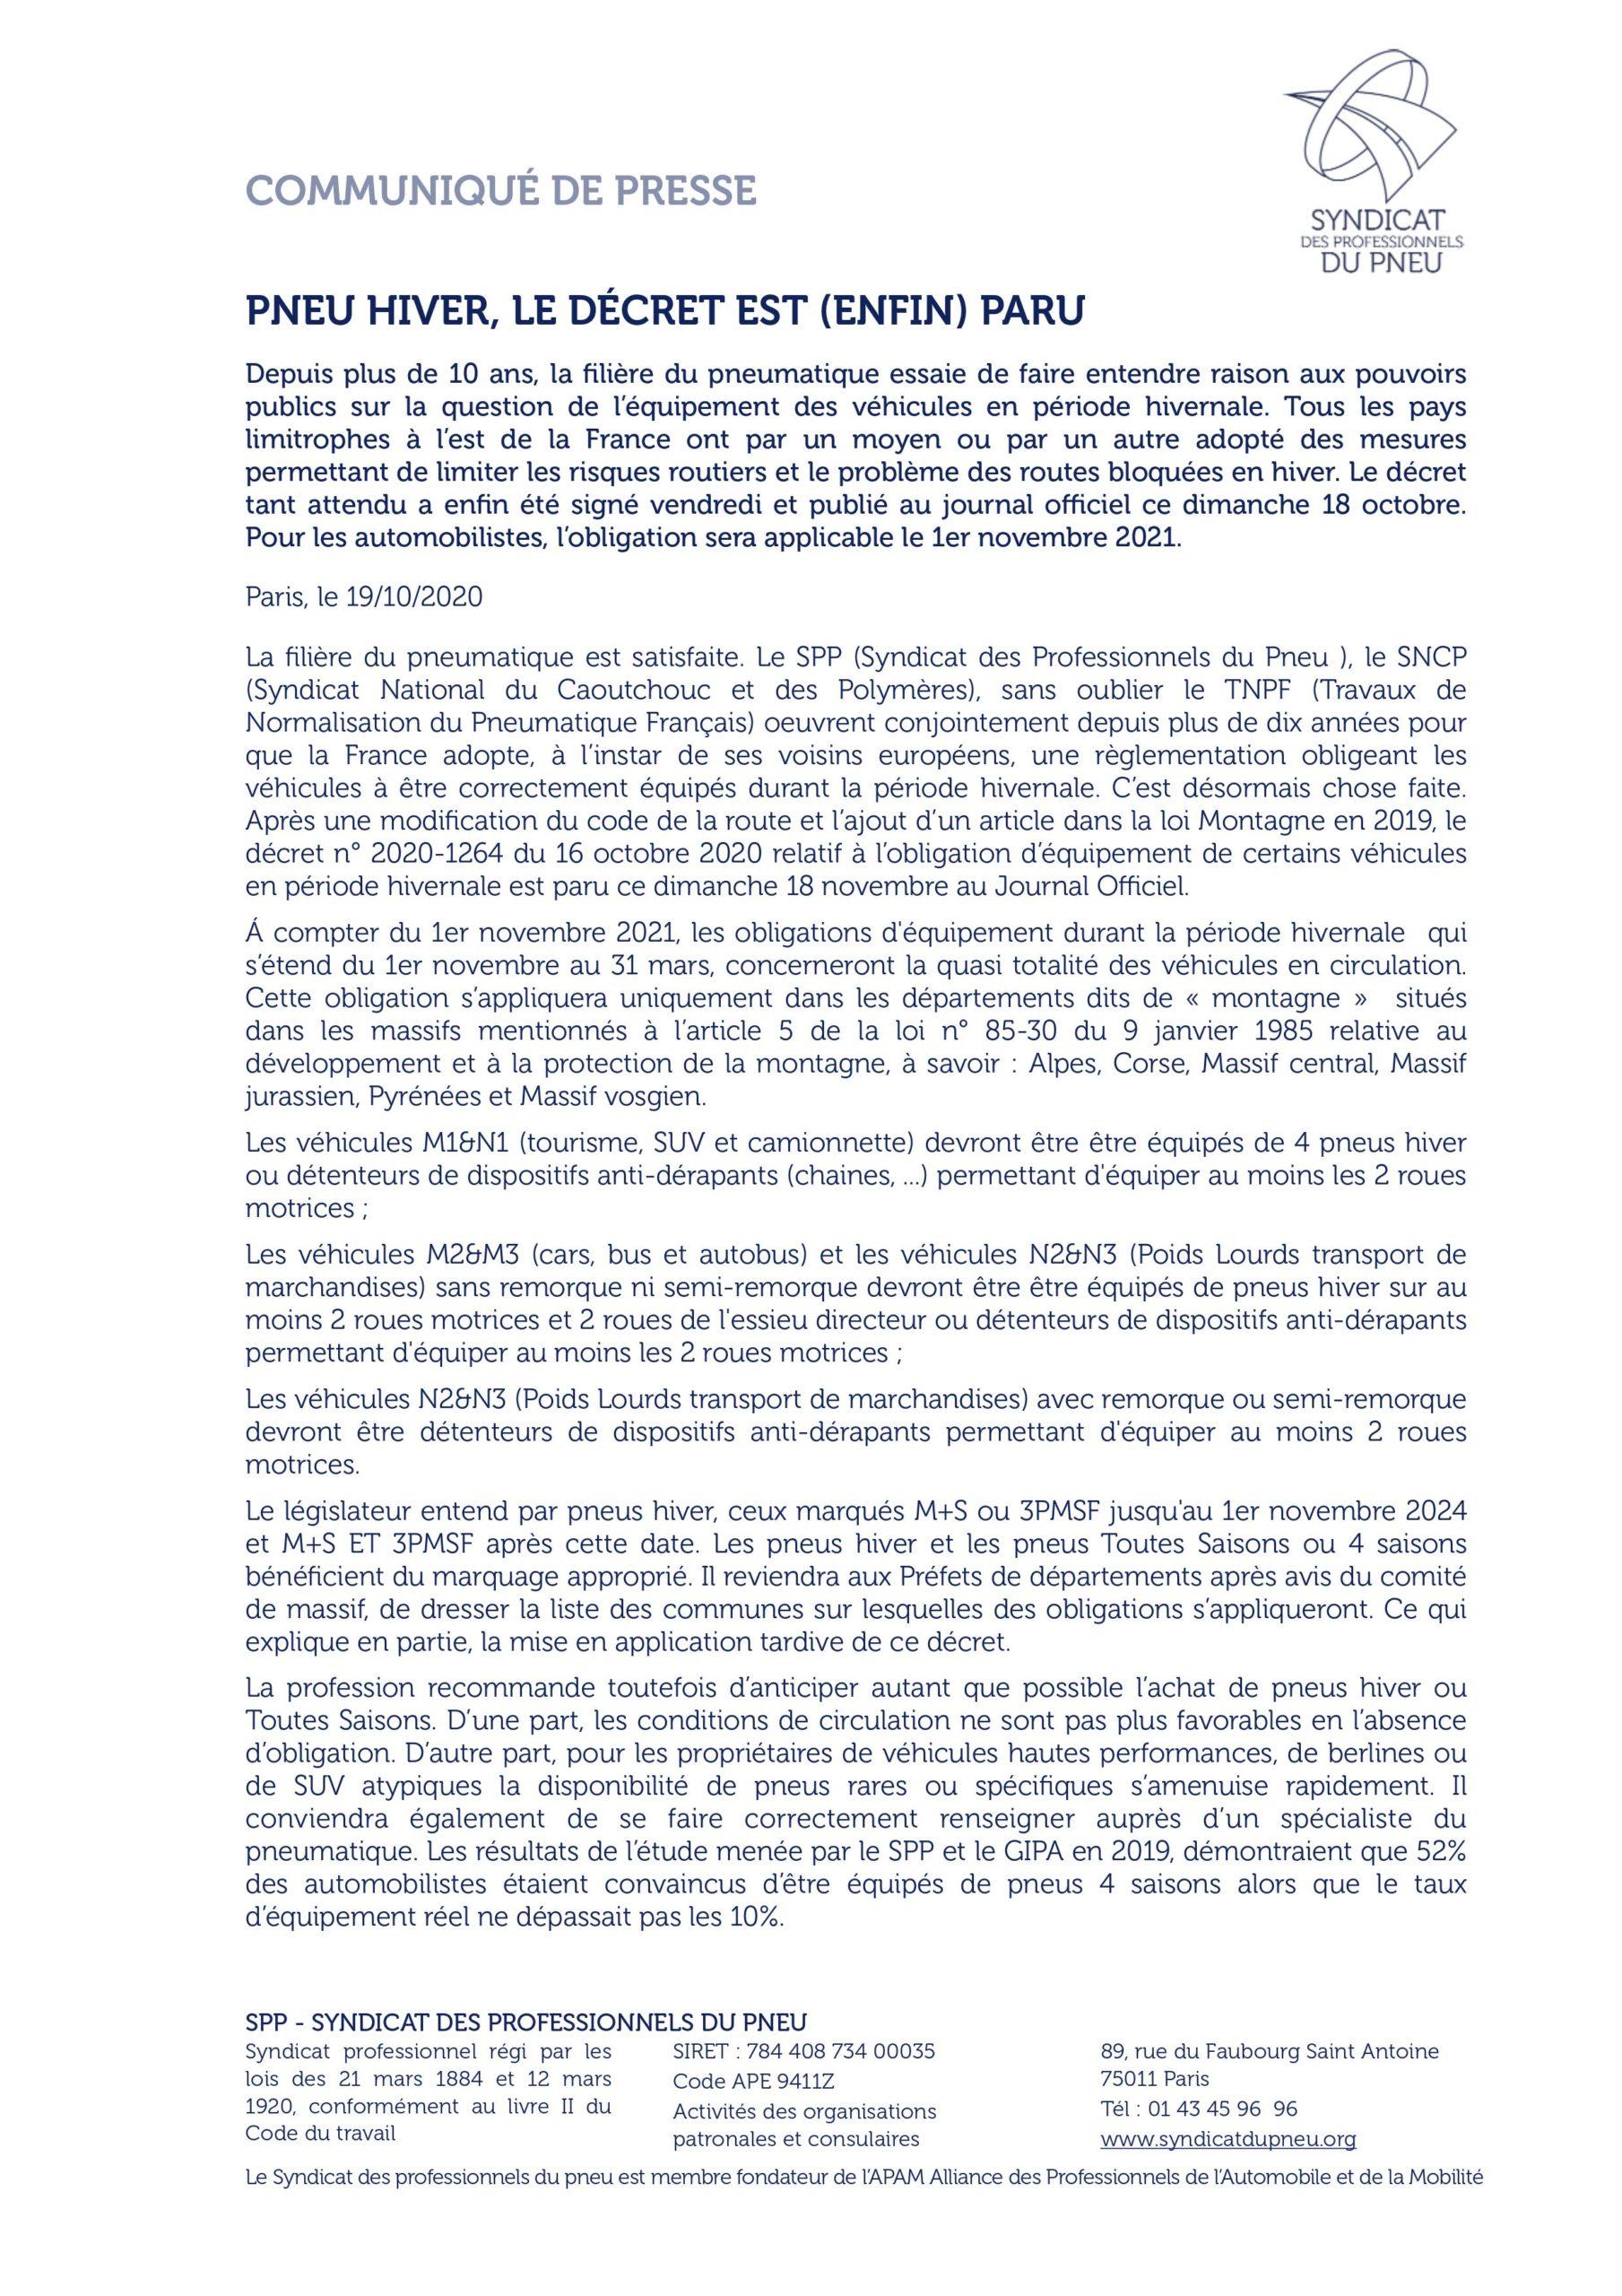 cp-decret-reglementation-pneu-hiver-spp-19-10-2020-1